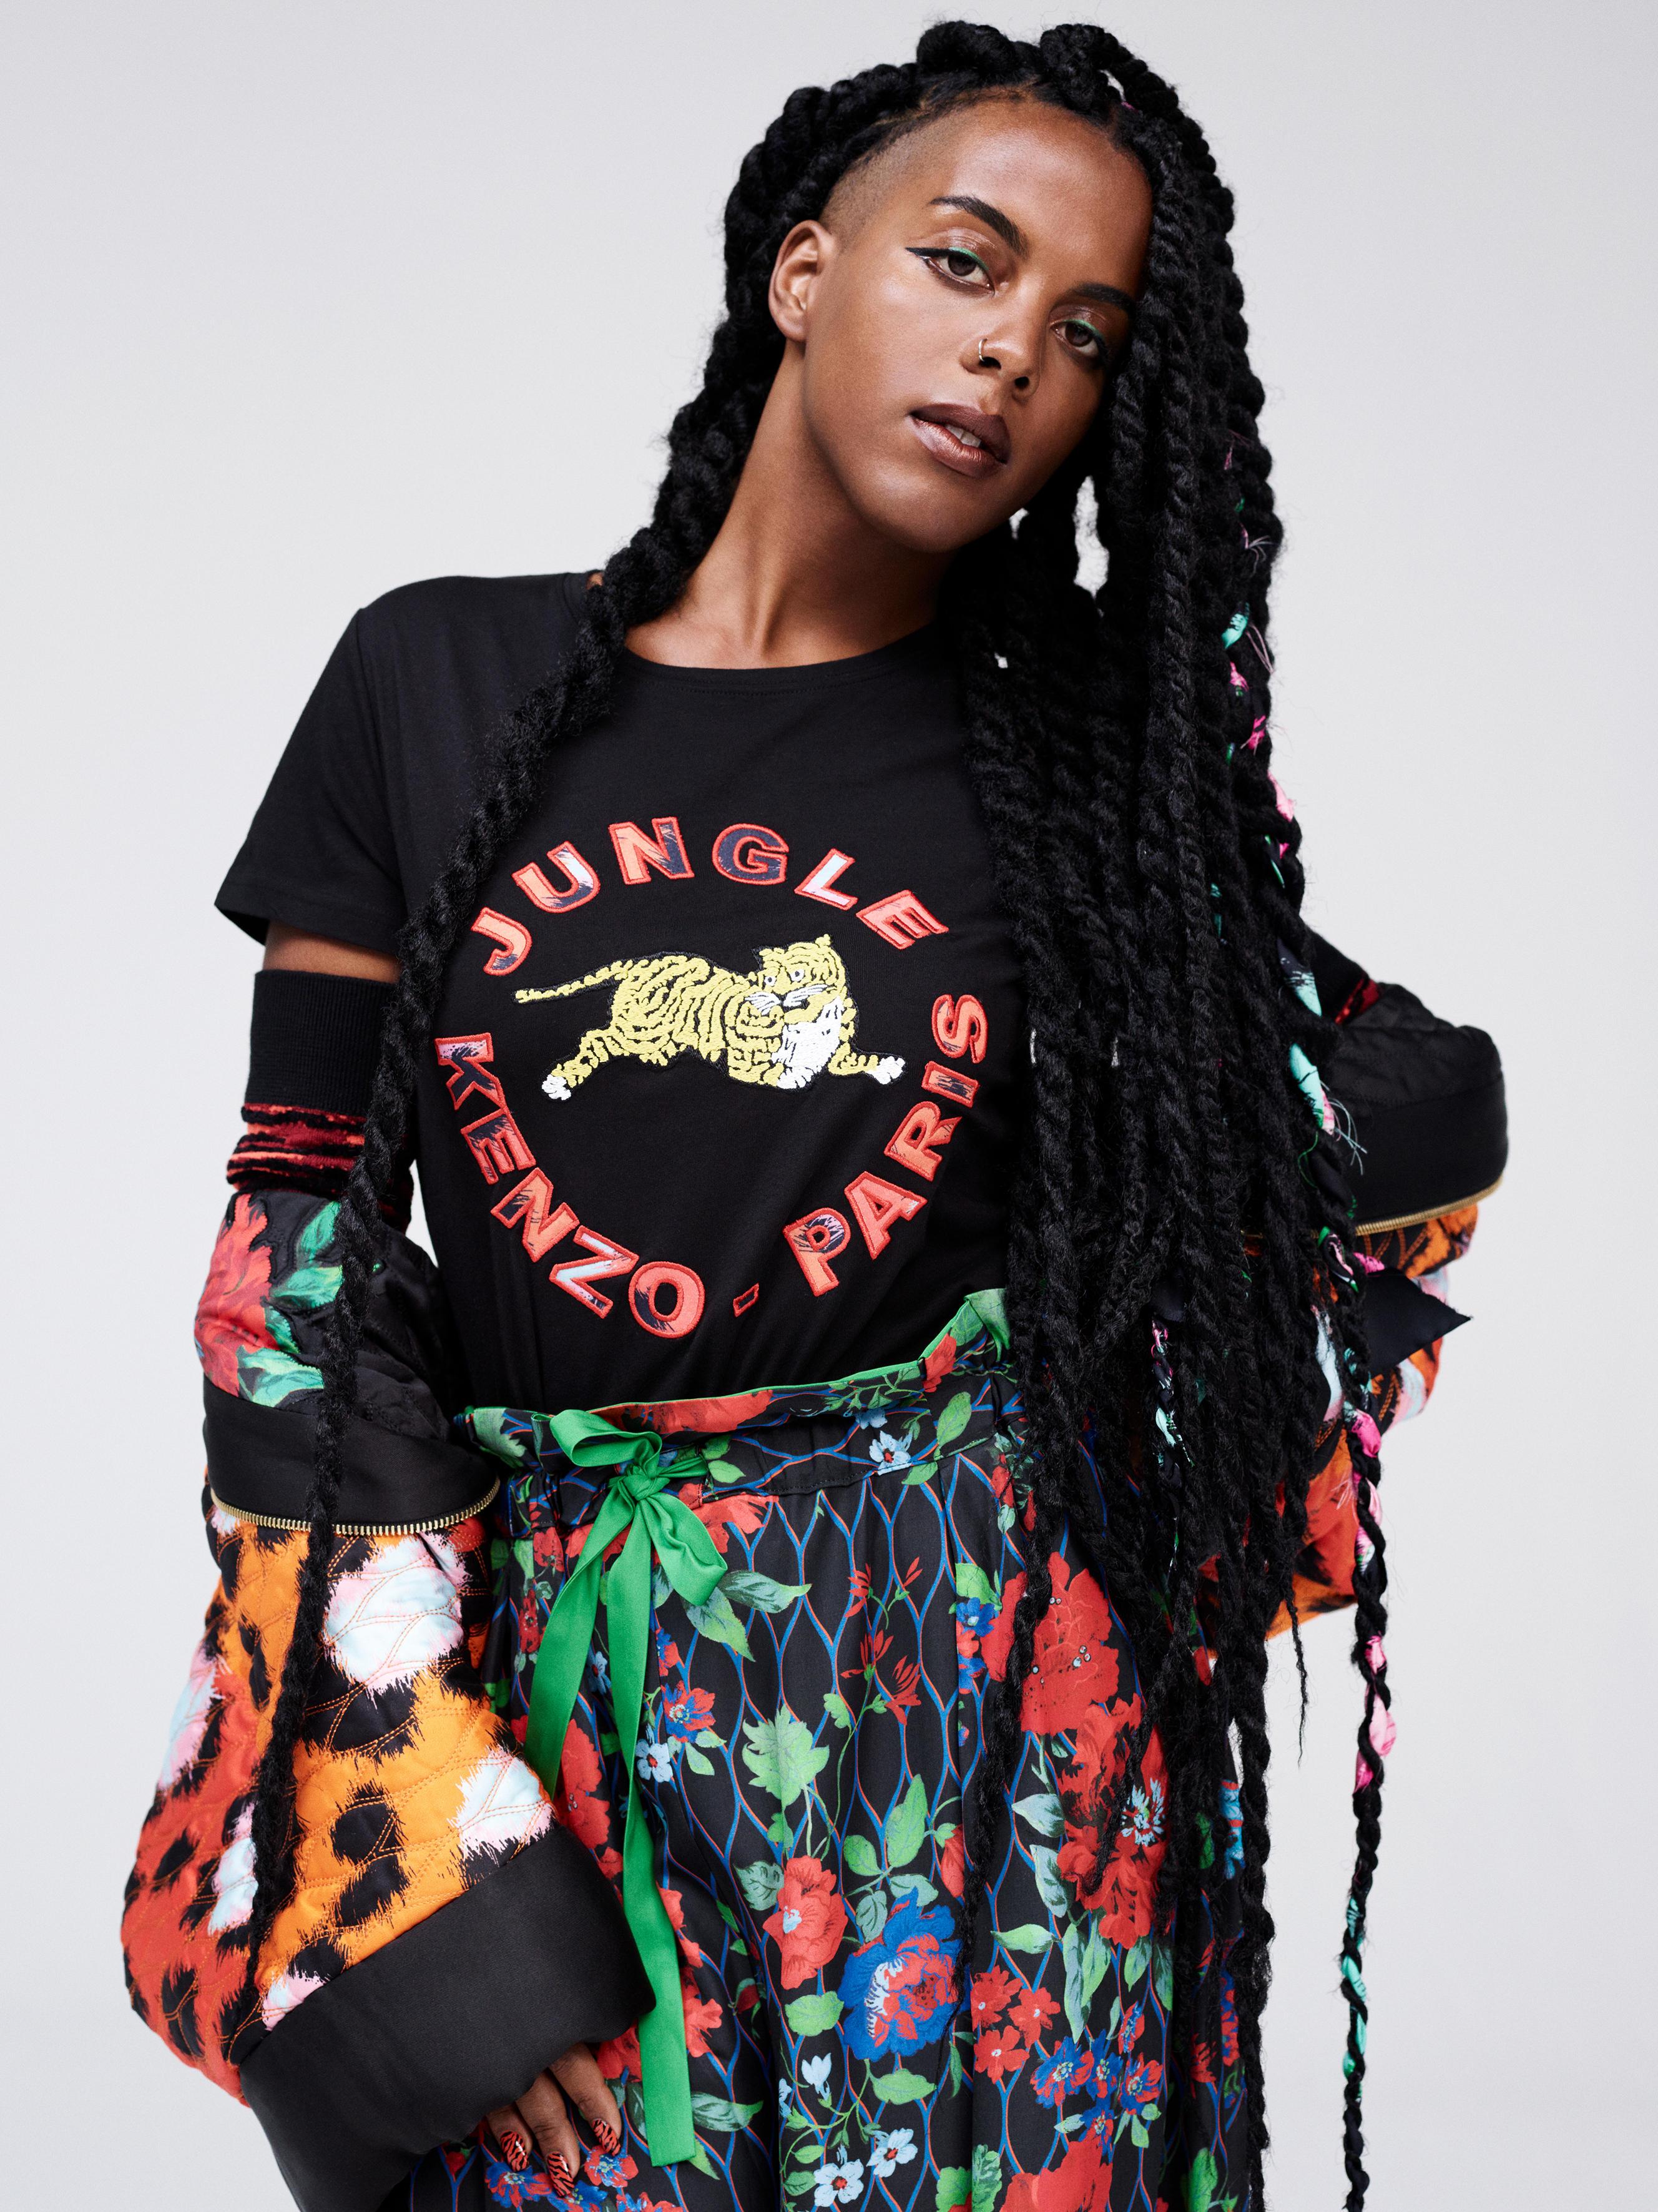 Artist/DJ Juliana Huxtable poses for Kenzo x H&M promotional photos